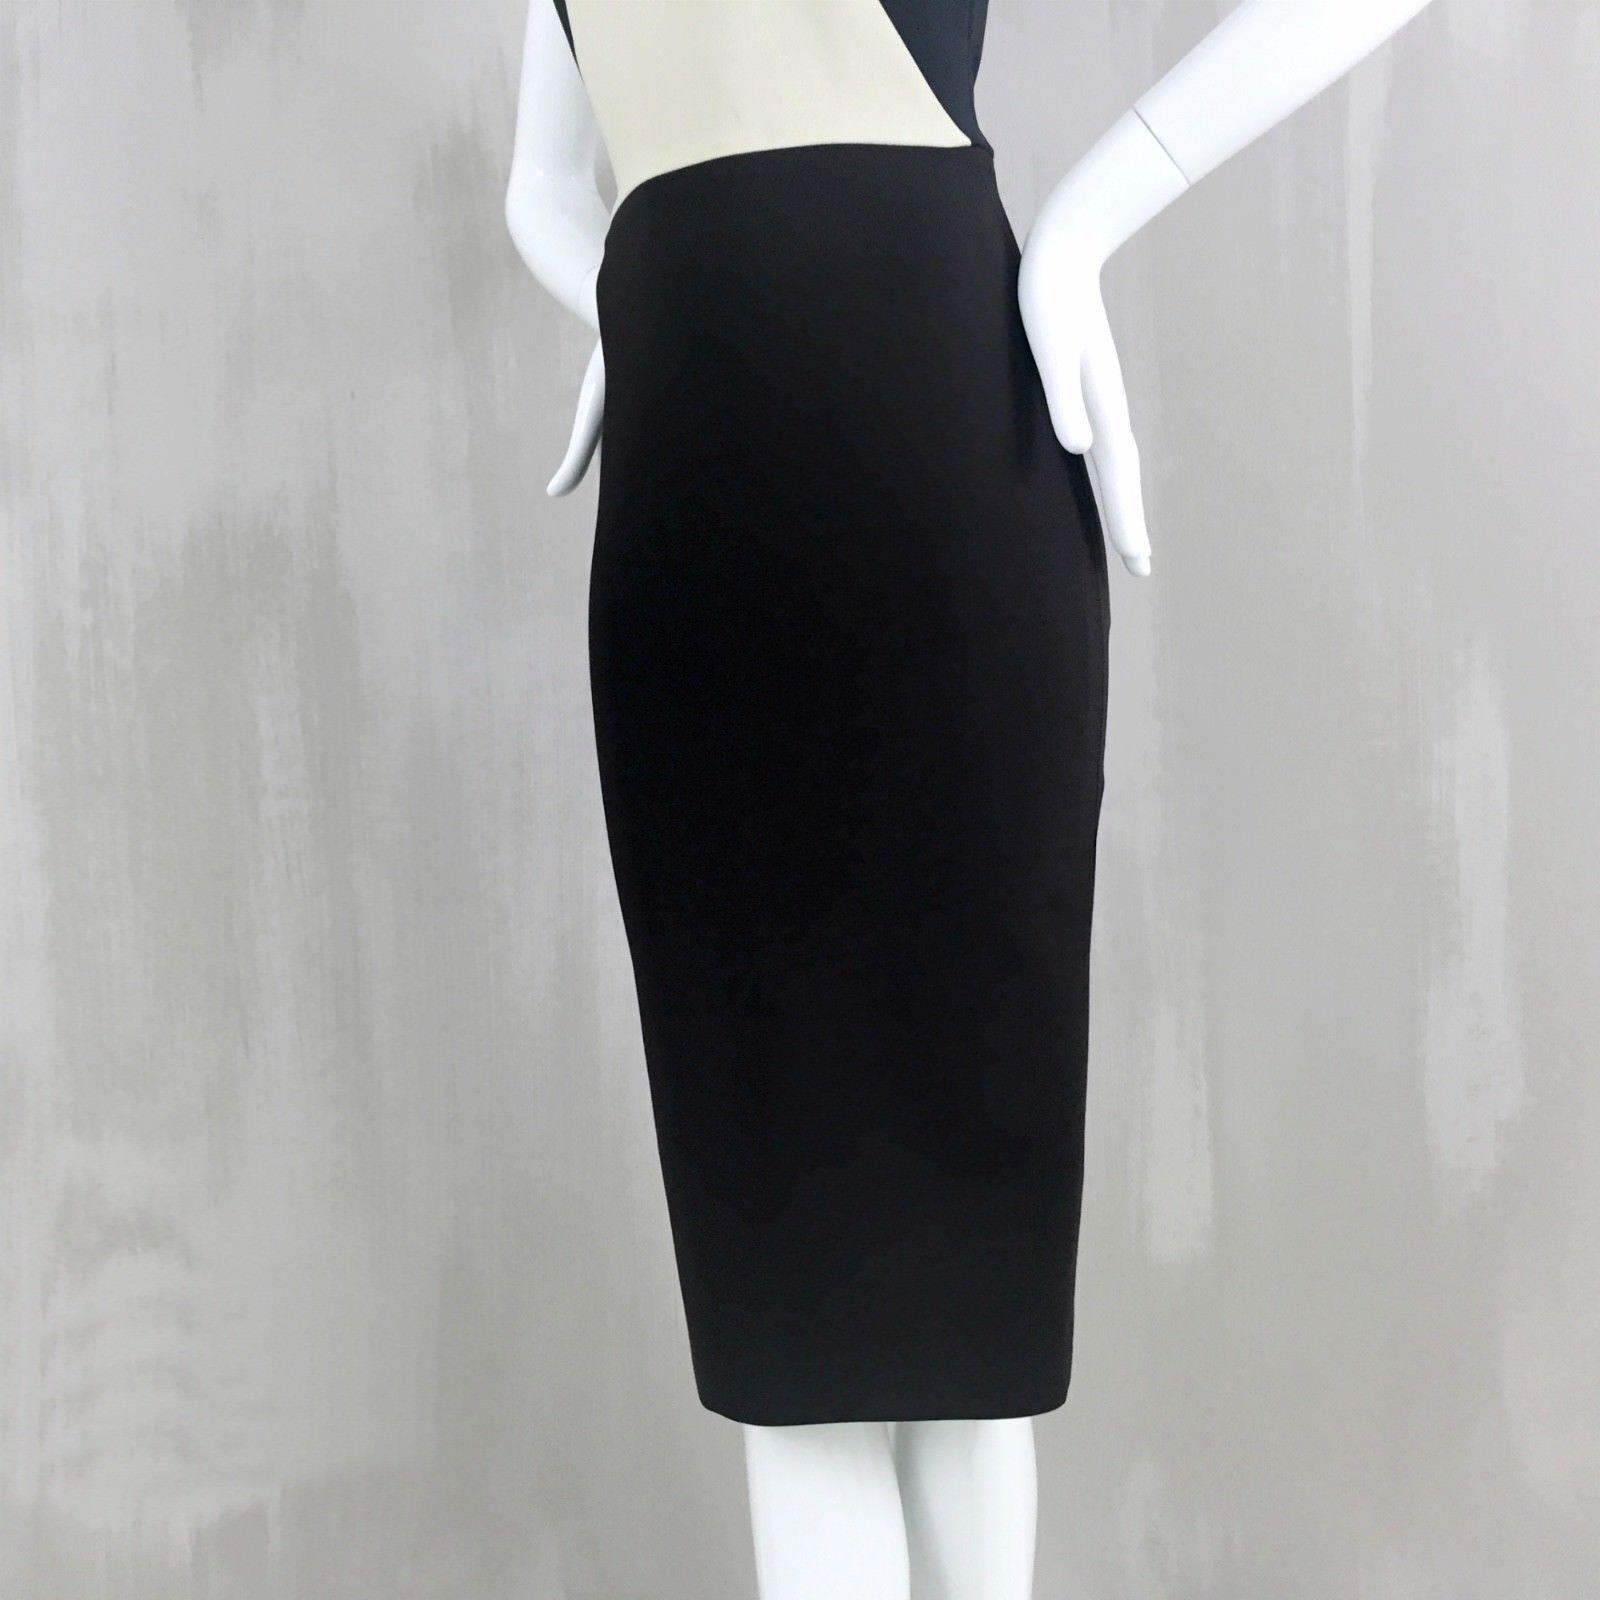 Victoria Beckham schwarz Weiß Back Zip Bodycon Fitted Pencil Pencil Pencil Day Dress Größe UK8 e94a1f